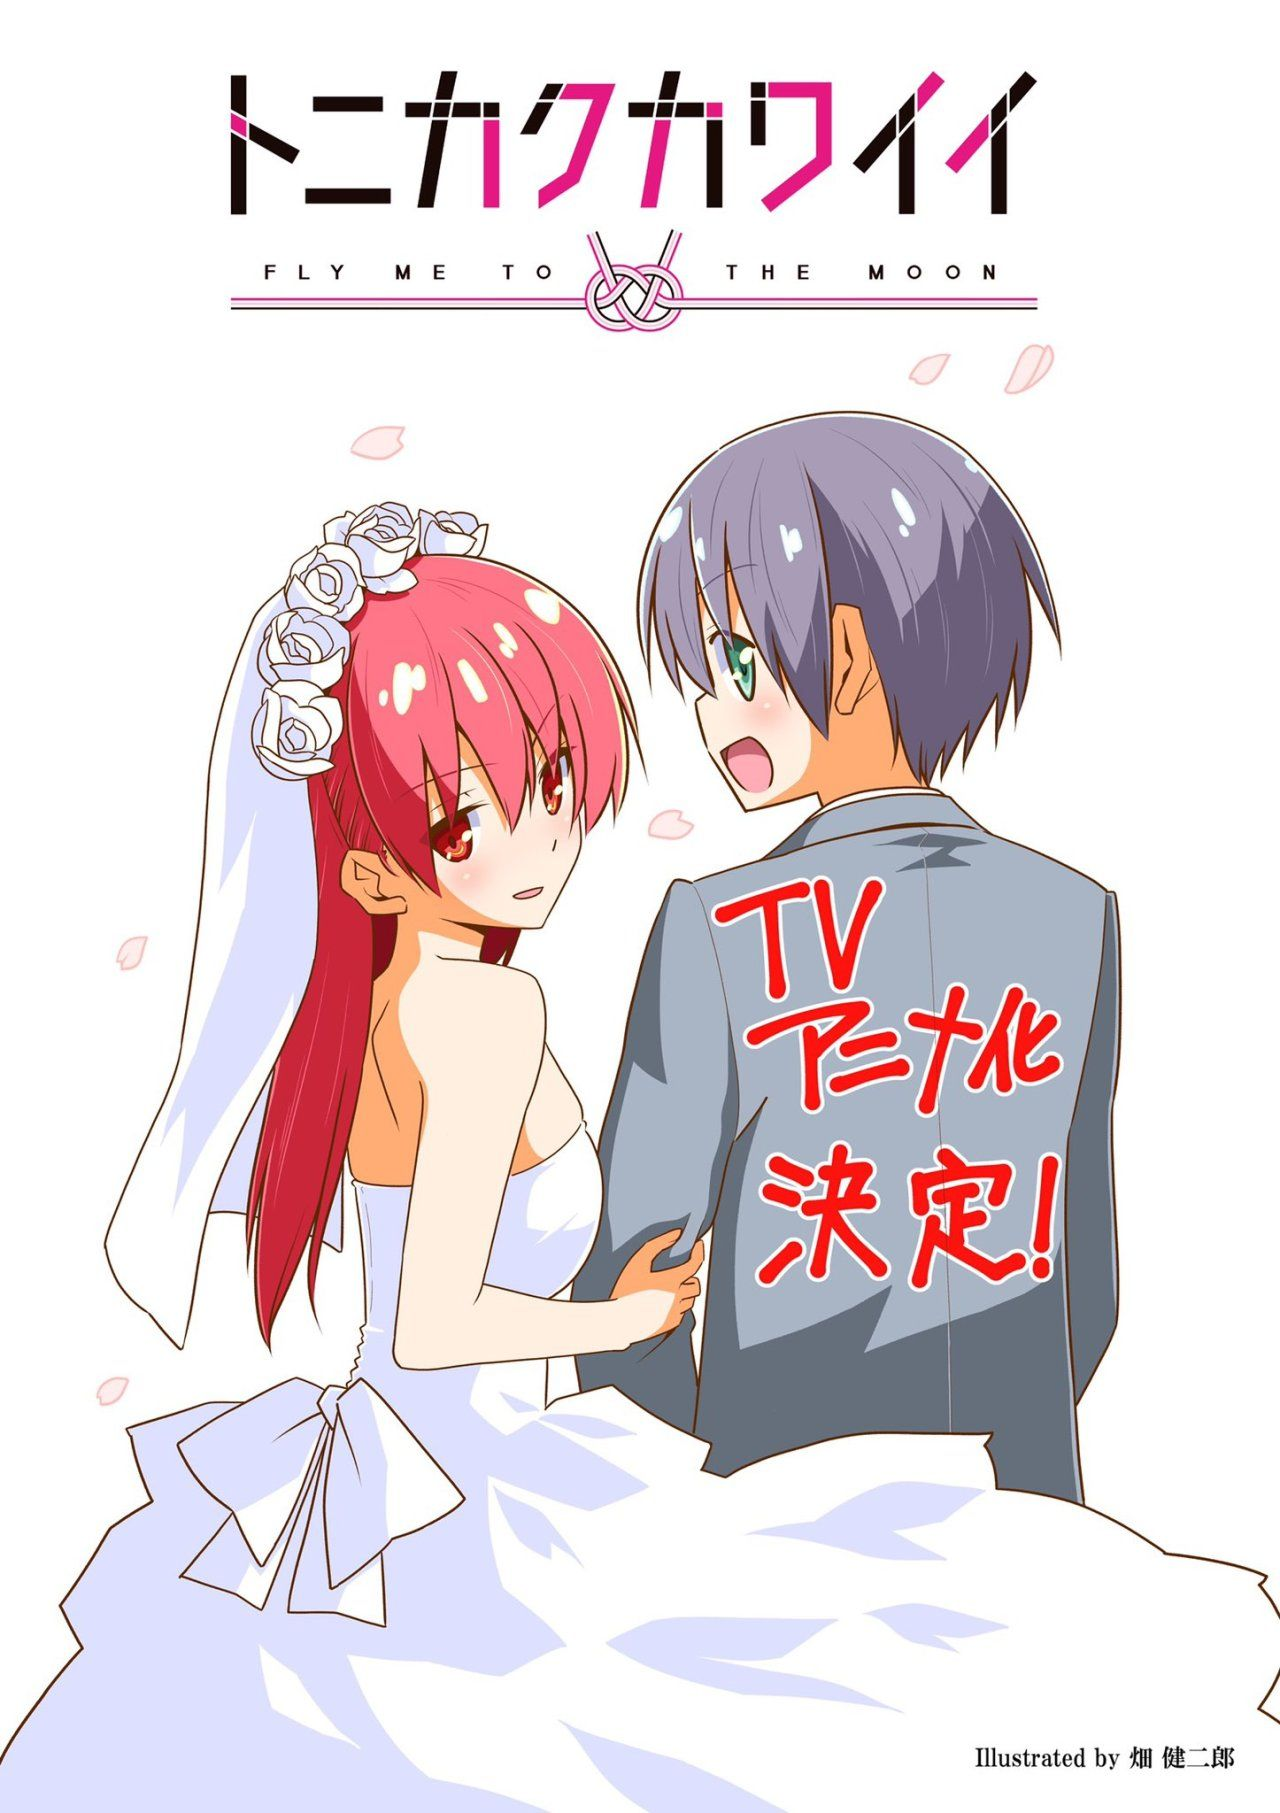 pkjd Kenjirou Hatas manga series Tonikaku Kawaii (Fly Me